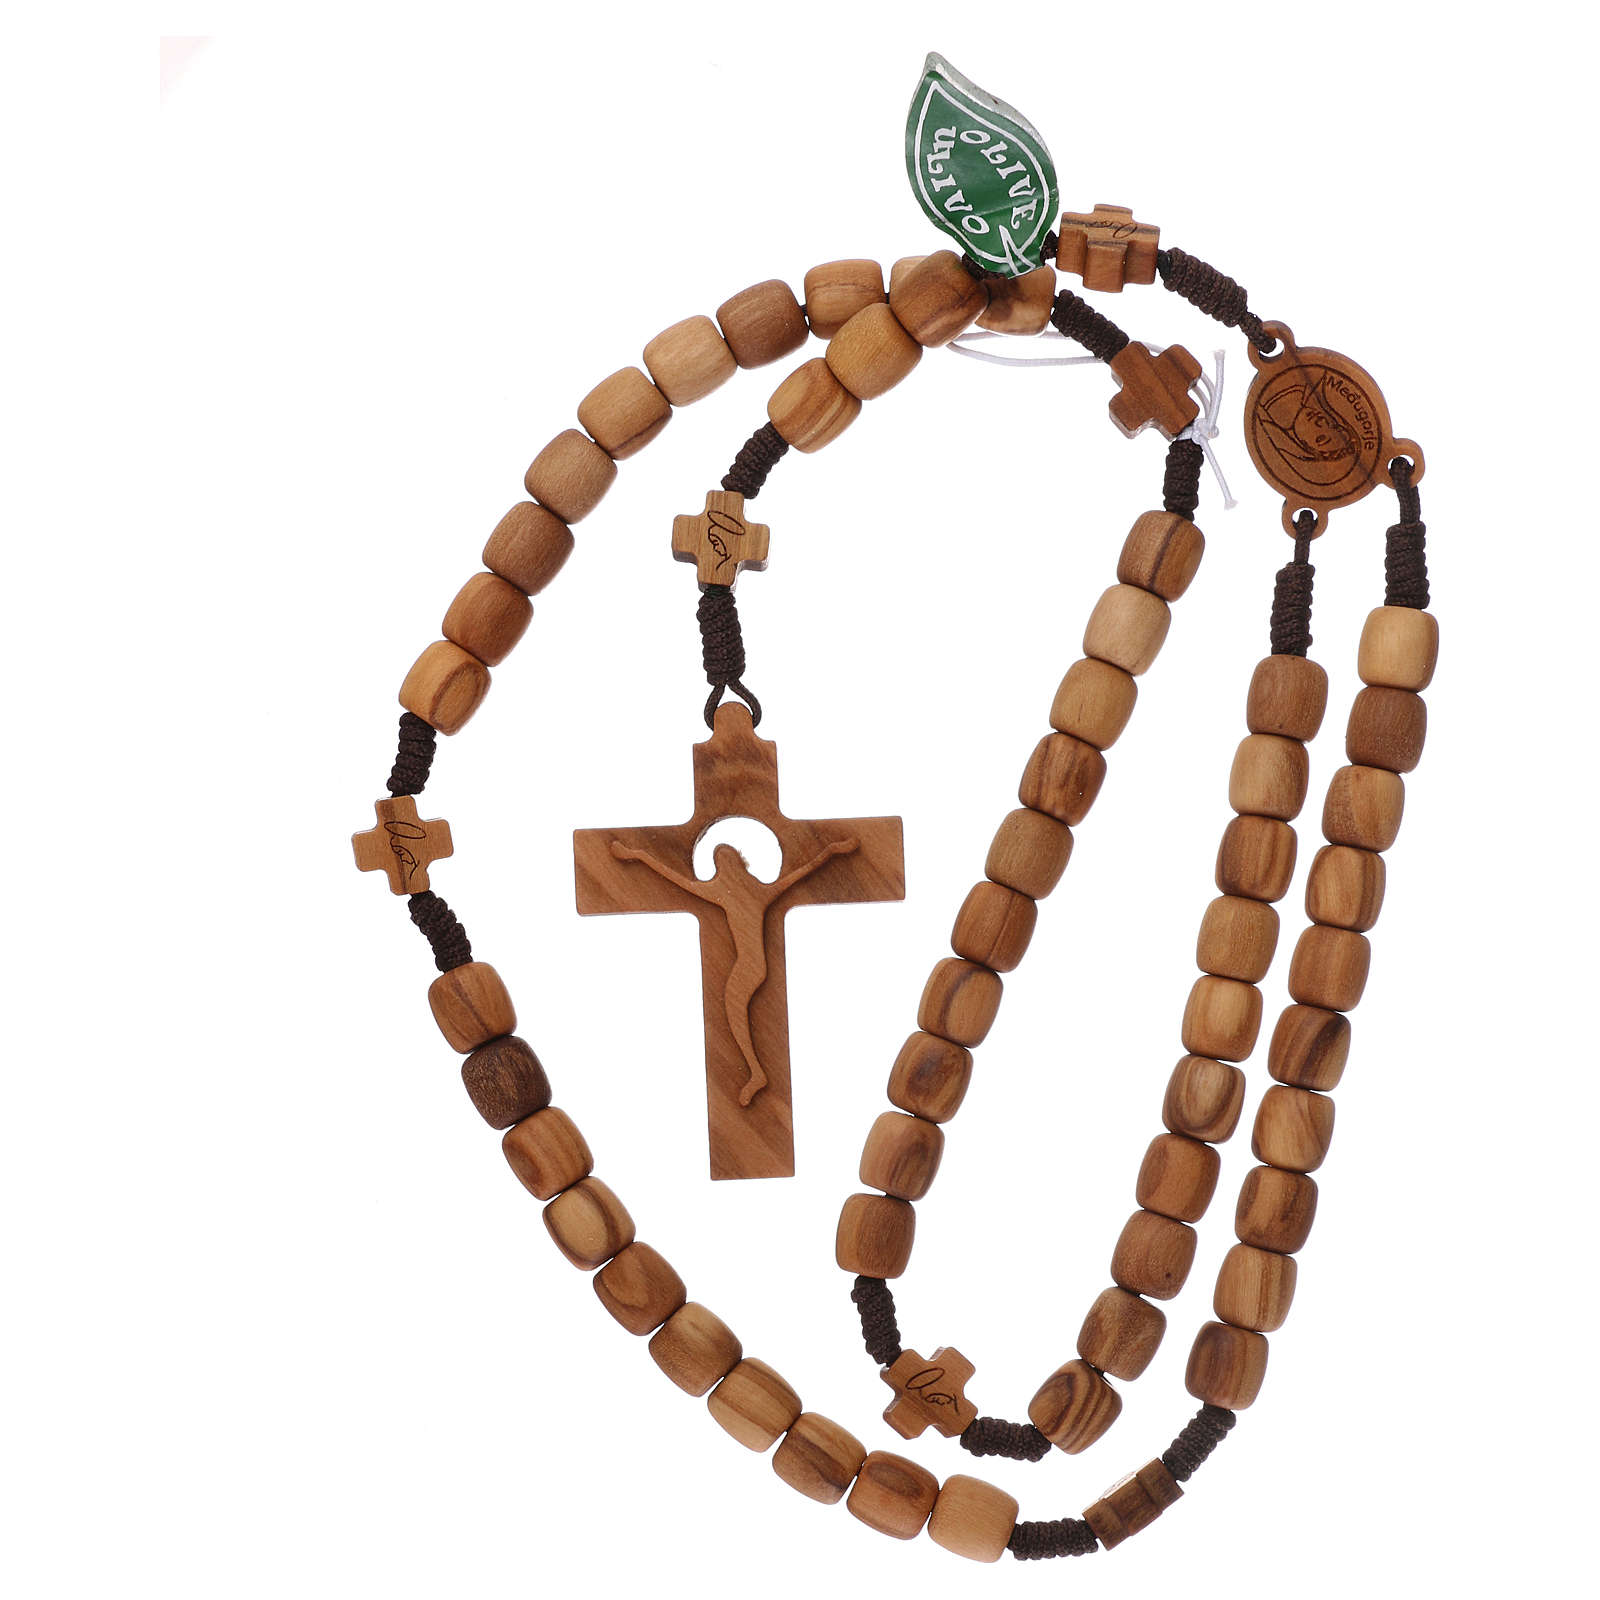 Chapelet Medjugorje croix grains 7 mm olivier corde marron 4